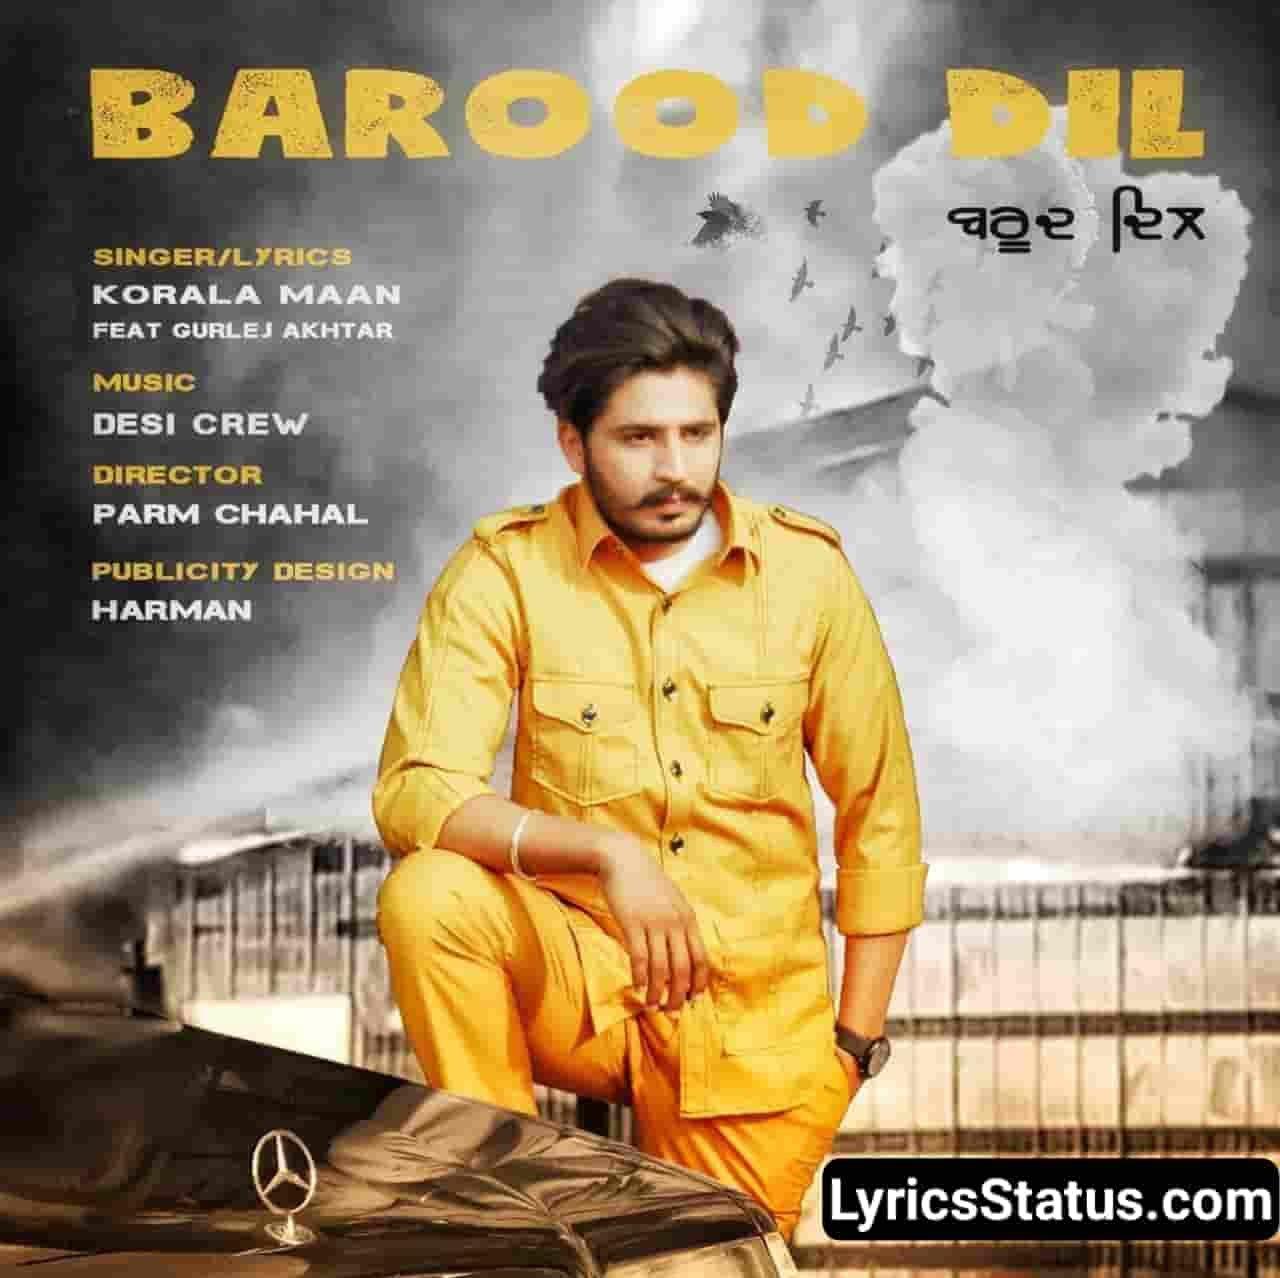 Korala Maan Tu firdi aa yaari laun nu Lyrics Status Download punjabi song Barood Dil Gurlej Akhtar Dil aali gall dassni Kite takkren kalli nu je tu kalla